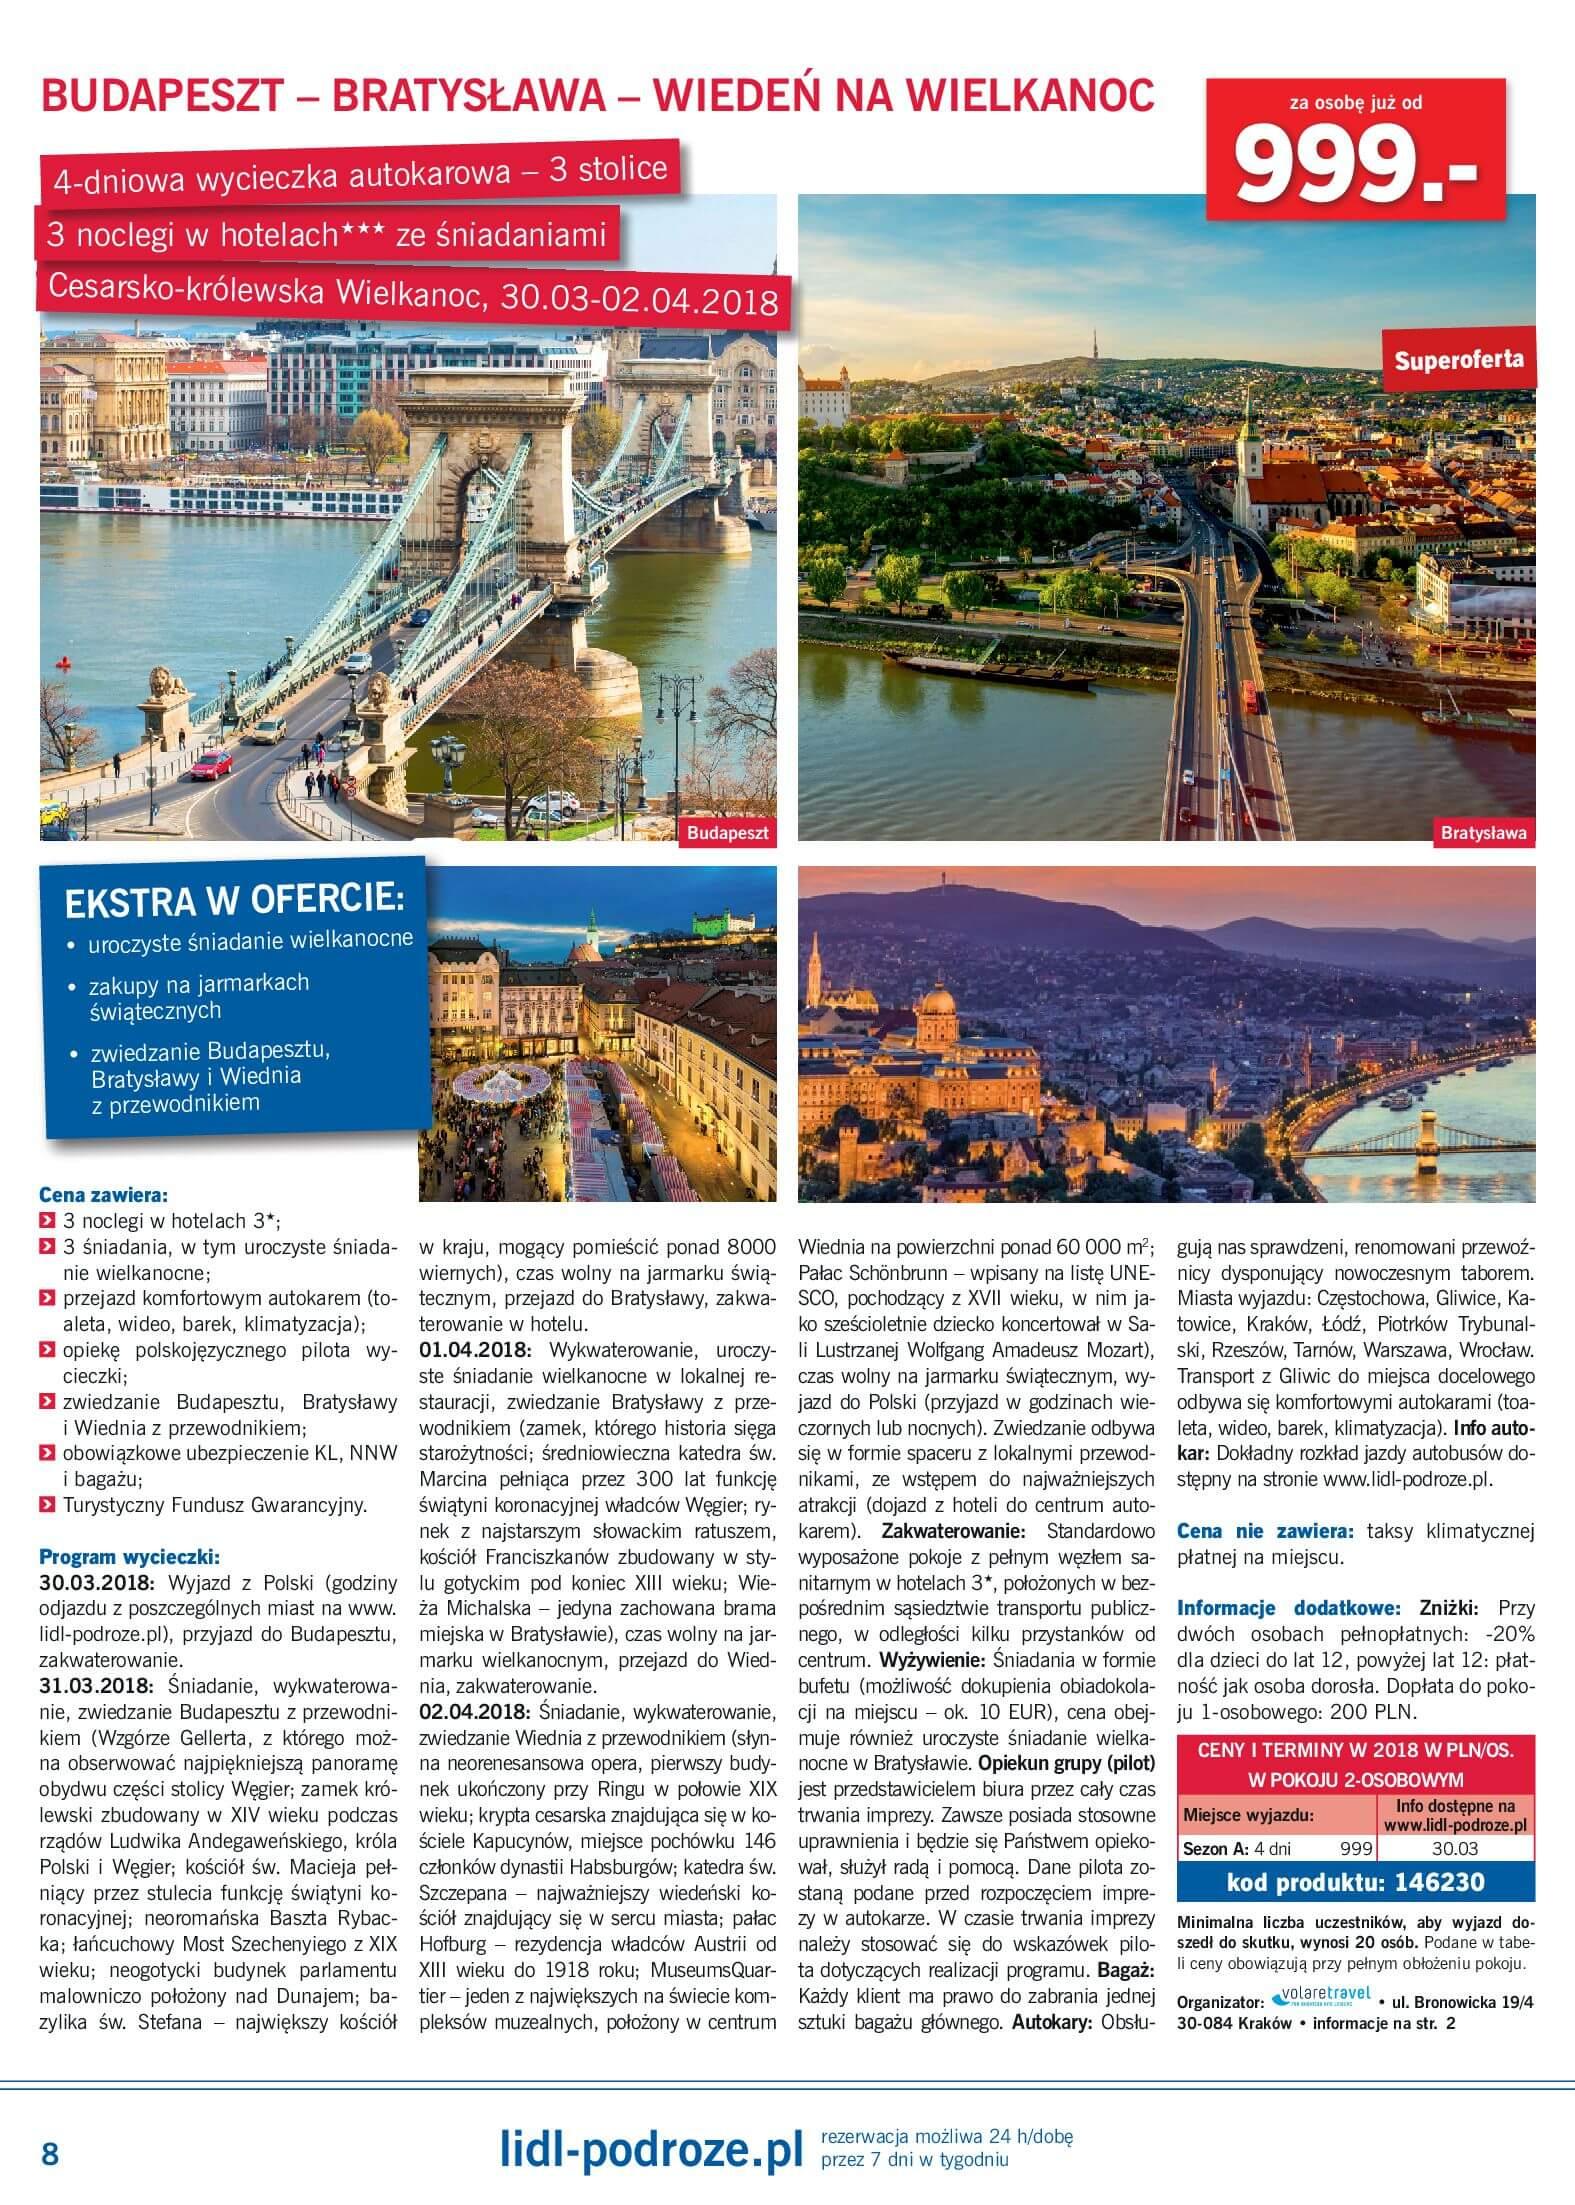 Gazetka Lidl - Lidl podróże-31.12.2017-28.01.2018-page-8